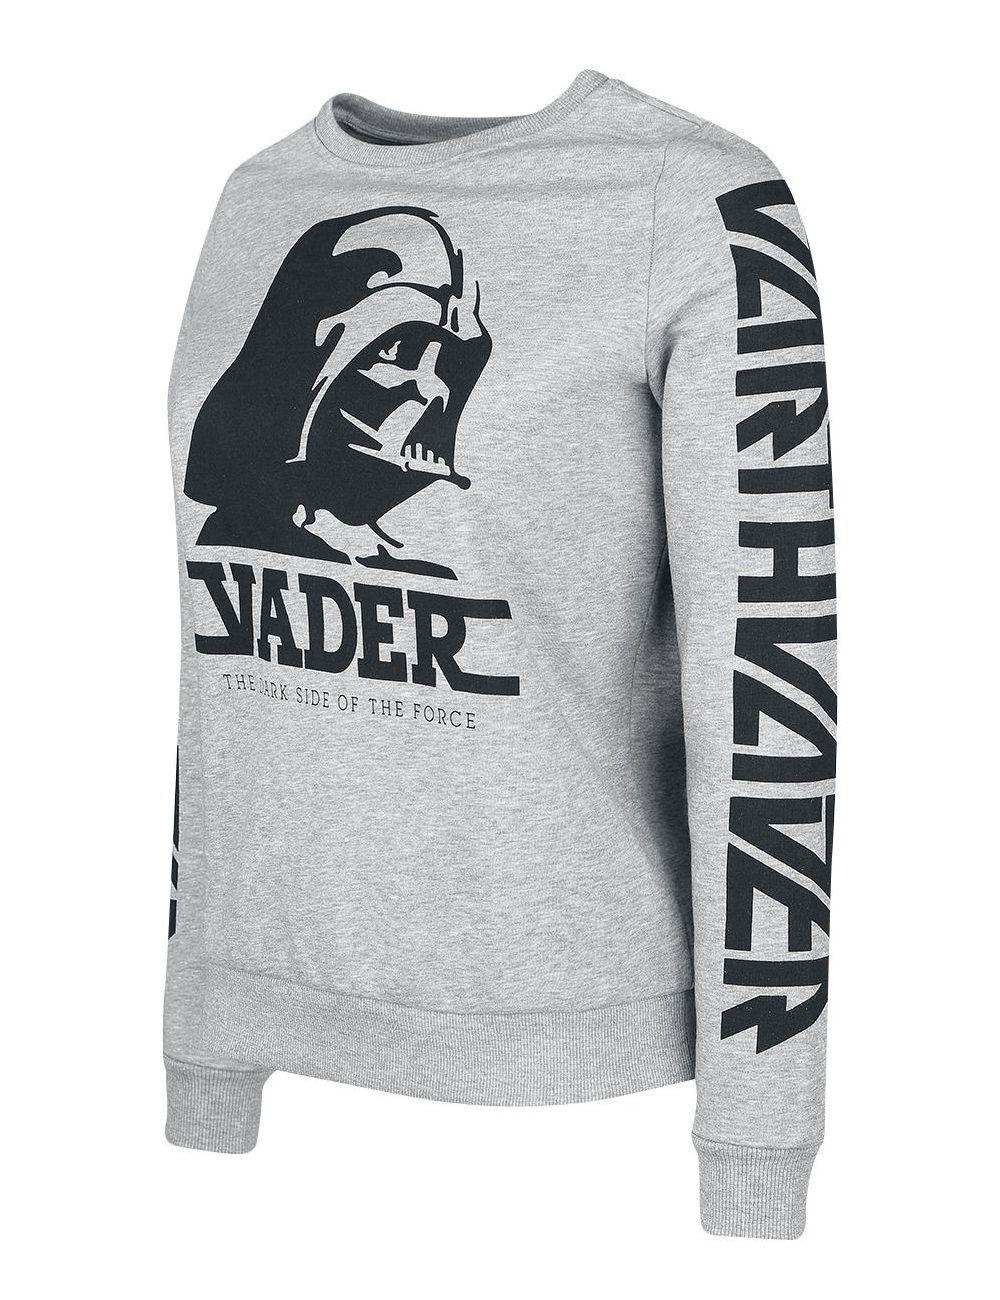 Women S Darth Vader Sweatshirt At Emp Online The Kessel Runway Sweatshirts Star Wars Jacket Long Sleeve Tshirt Men [ 1300 x 1000 Pixel ]